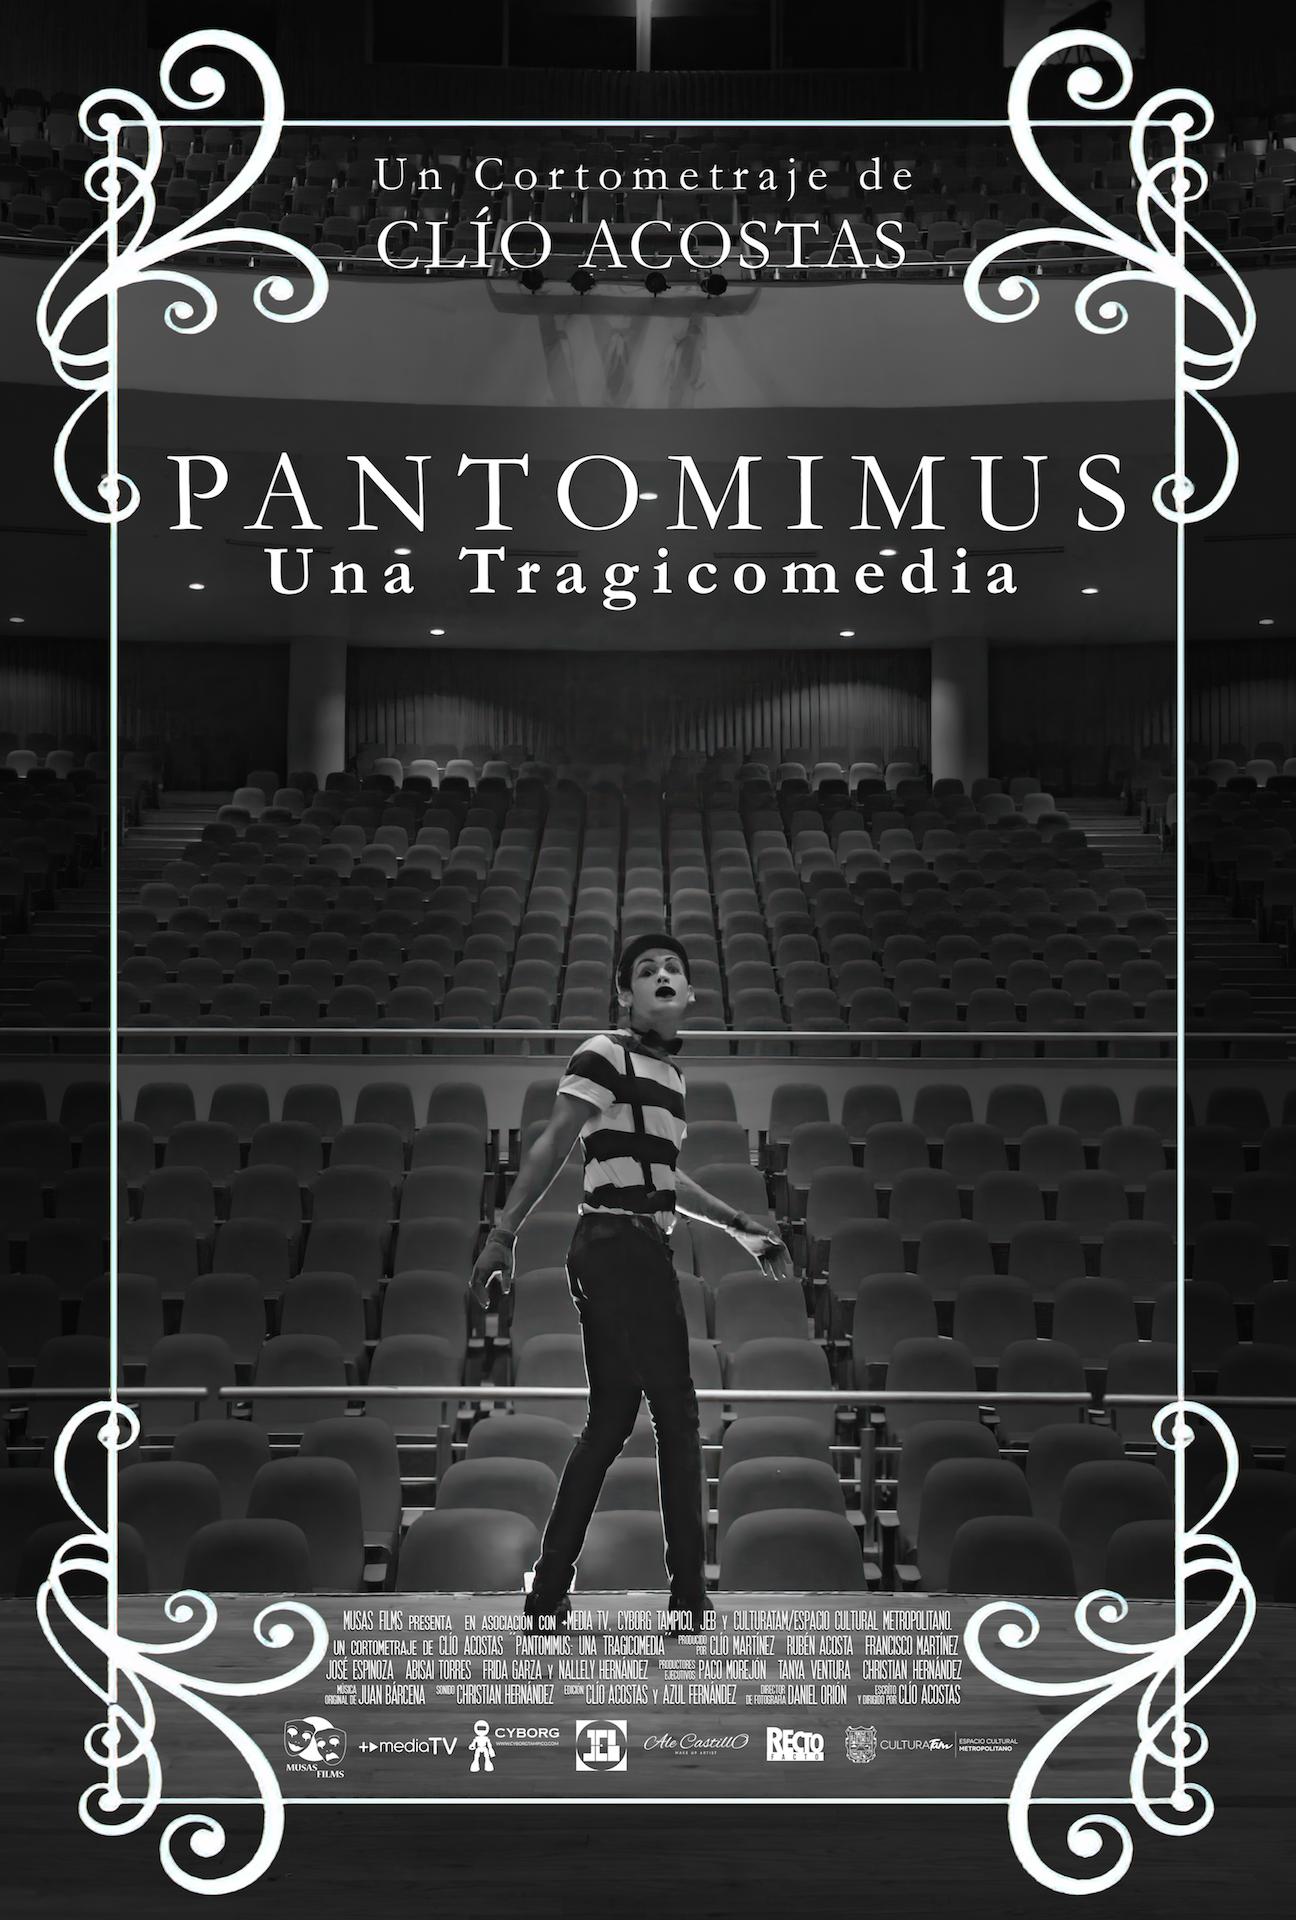 PANTOMIMUS una tragicomedia